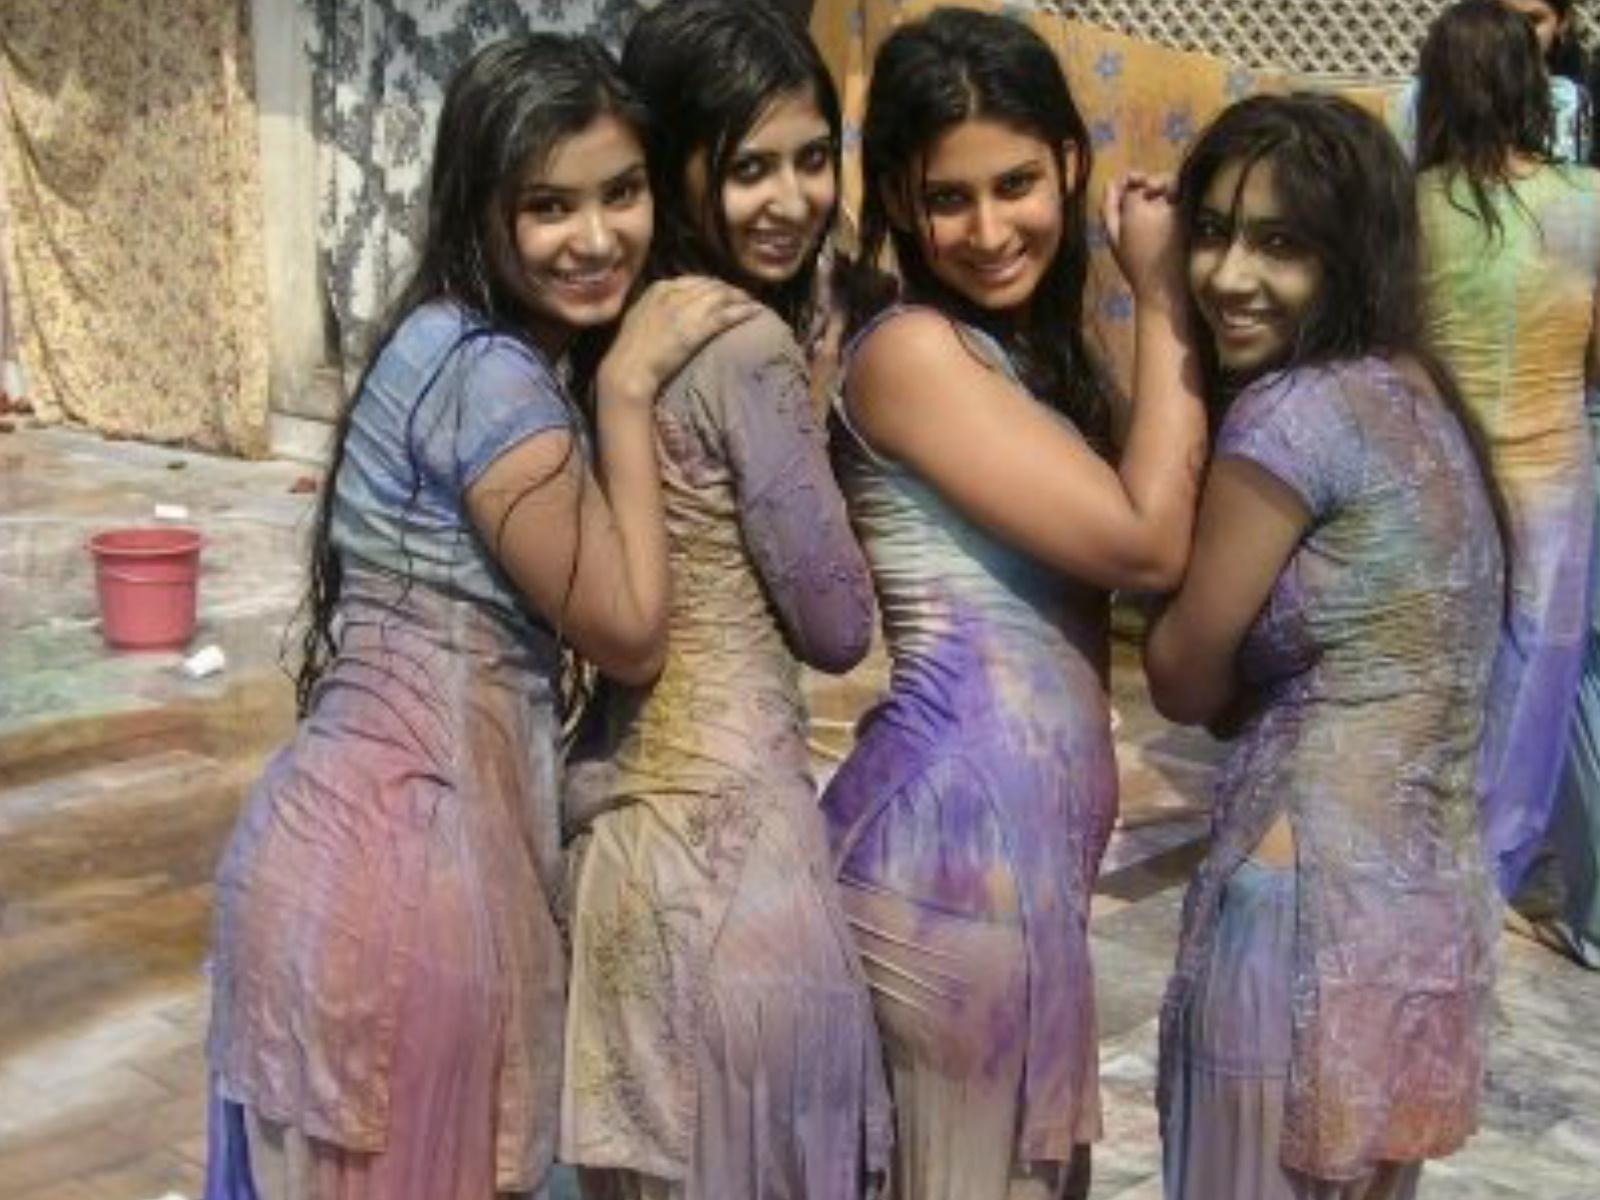 Pakistani pron photos nude videos